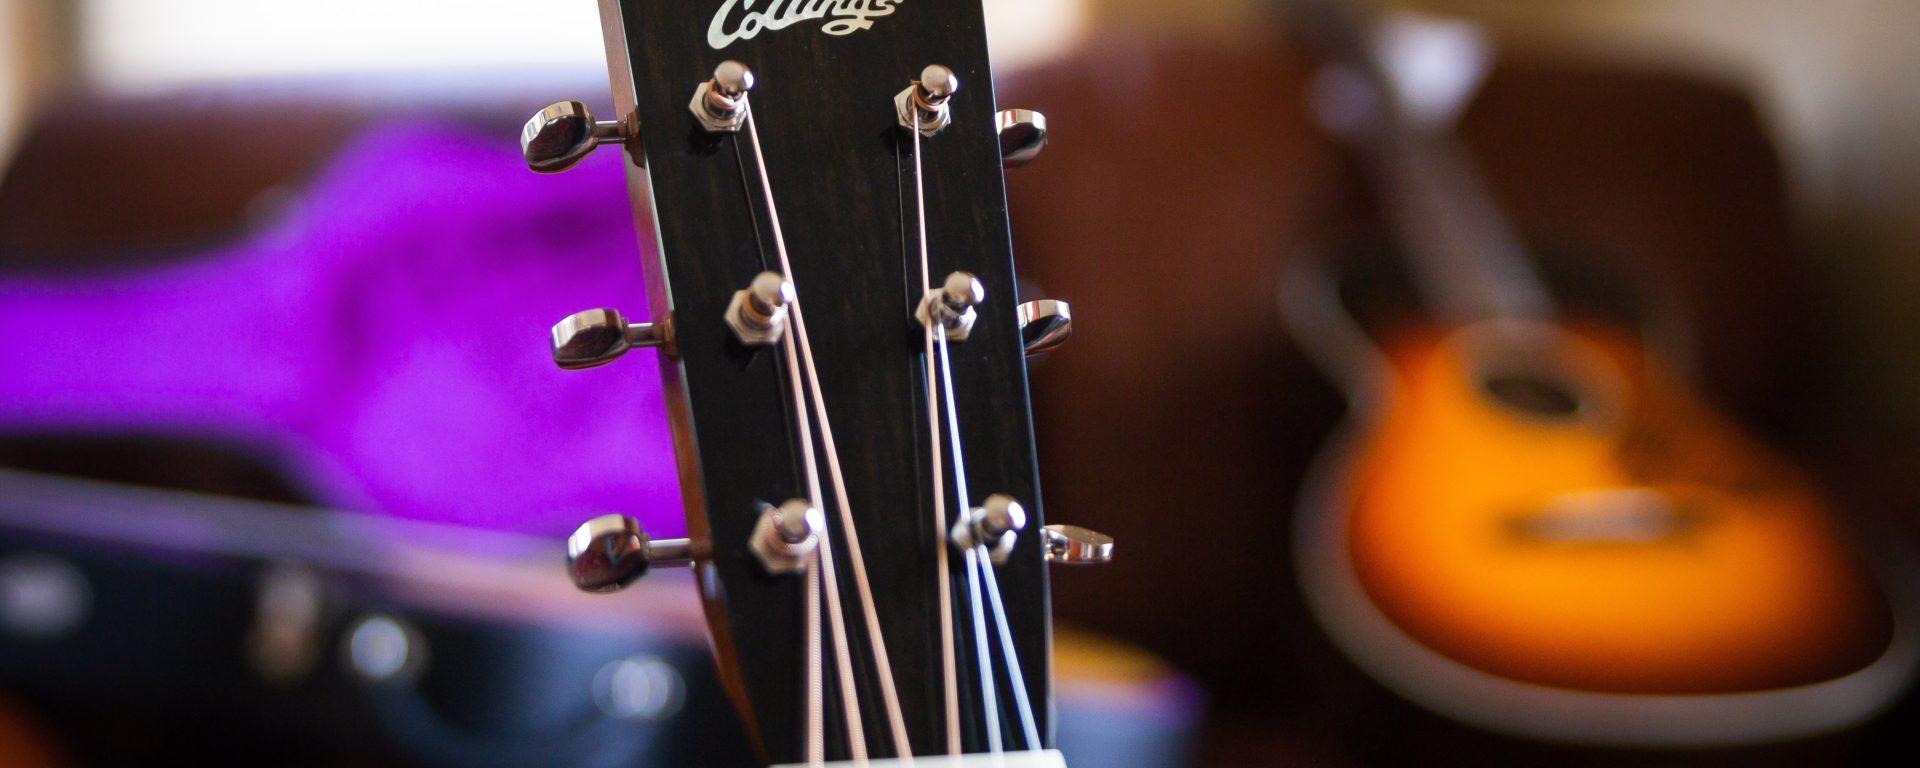 Collings Guitars 1 11/16 Traditional Series Models